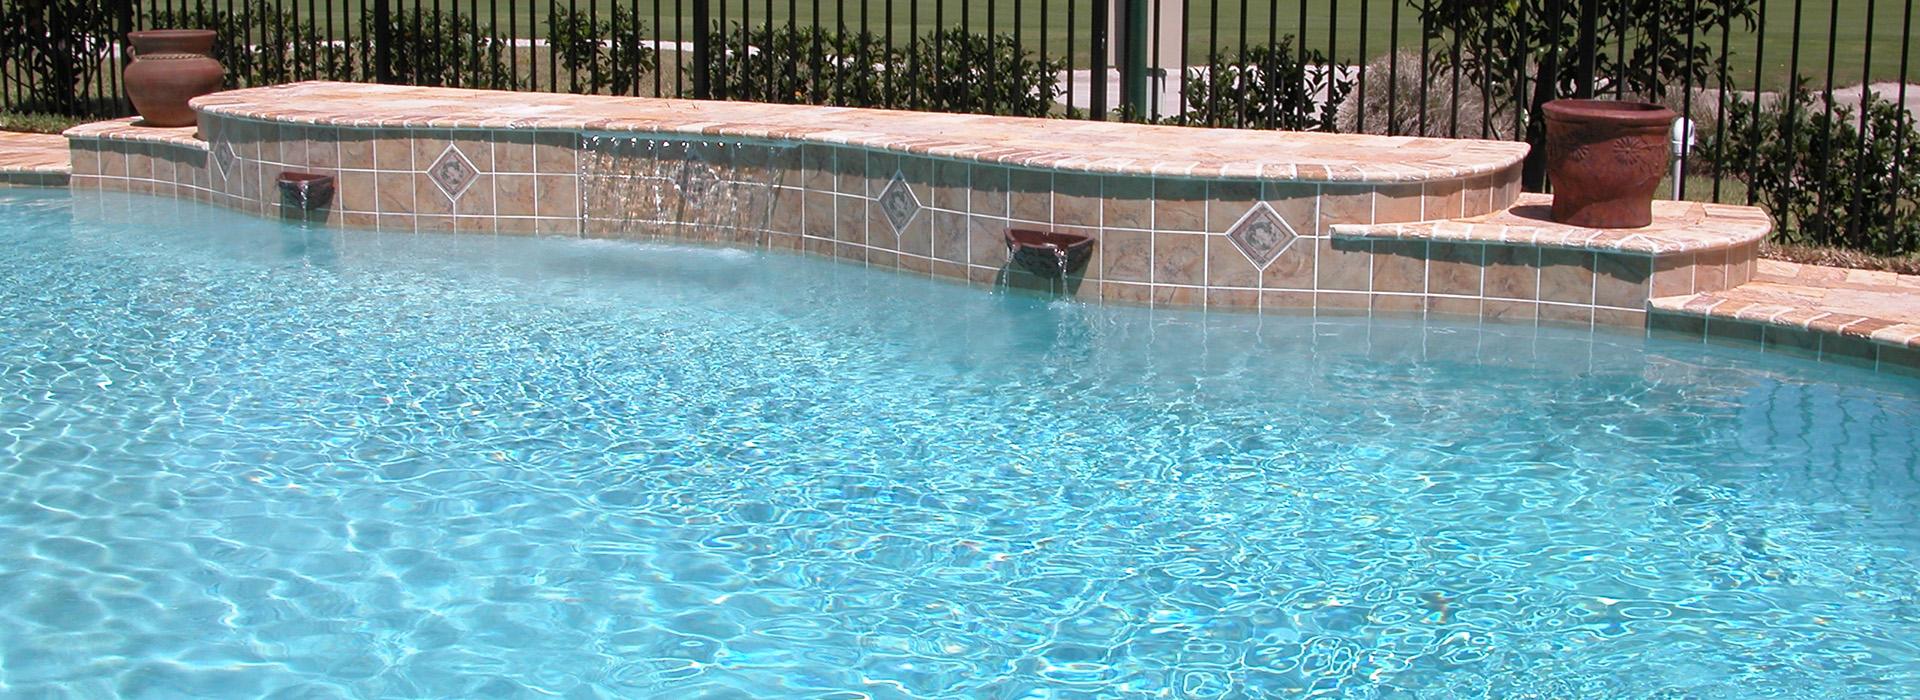 Crystal Clear Pool